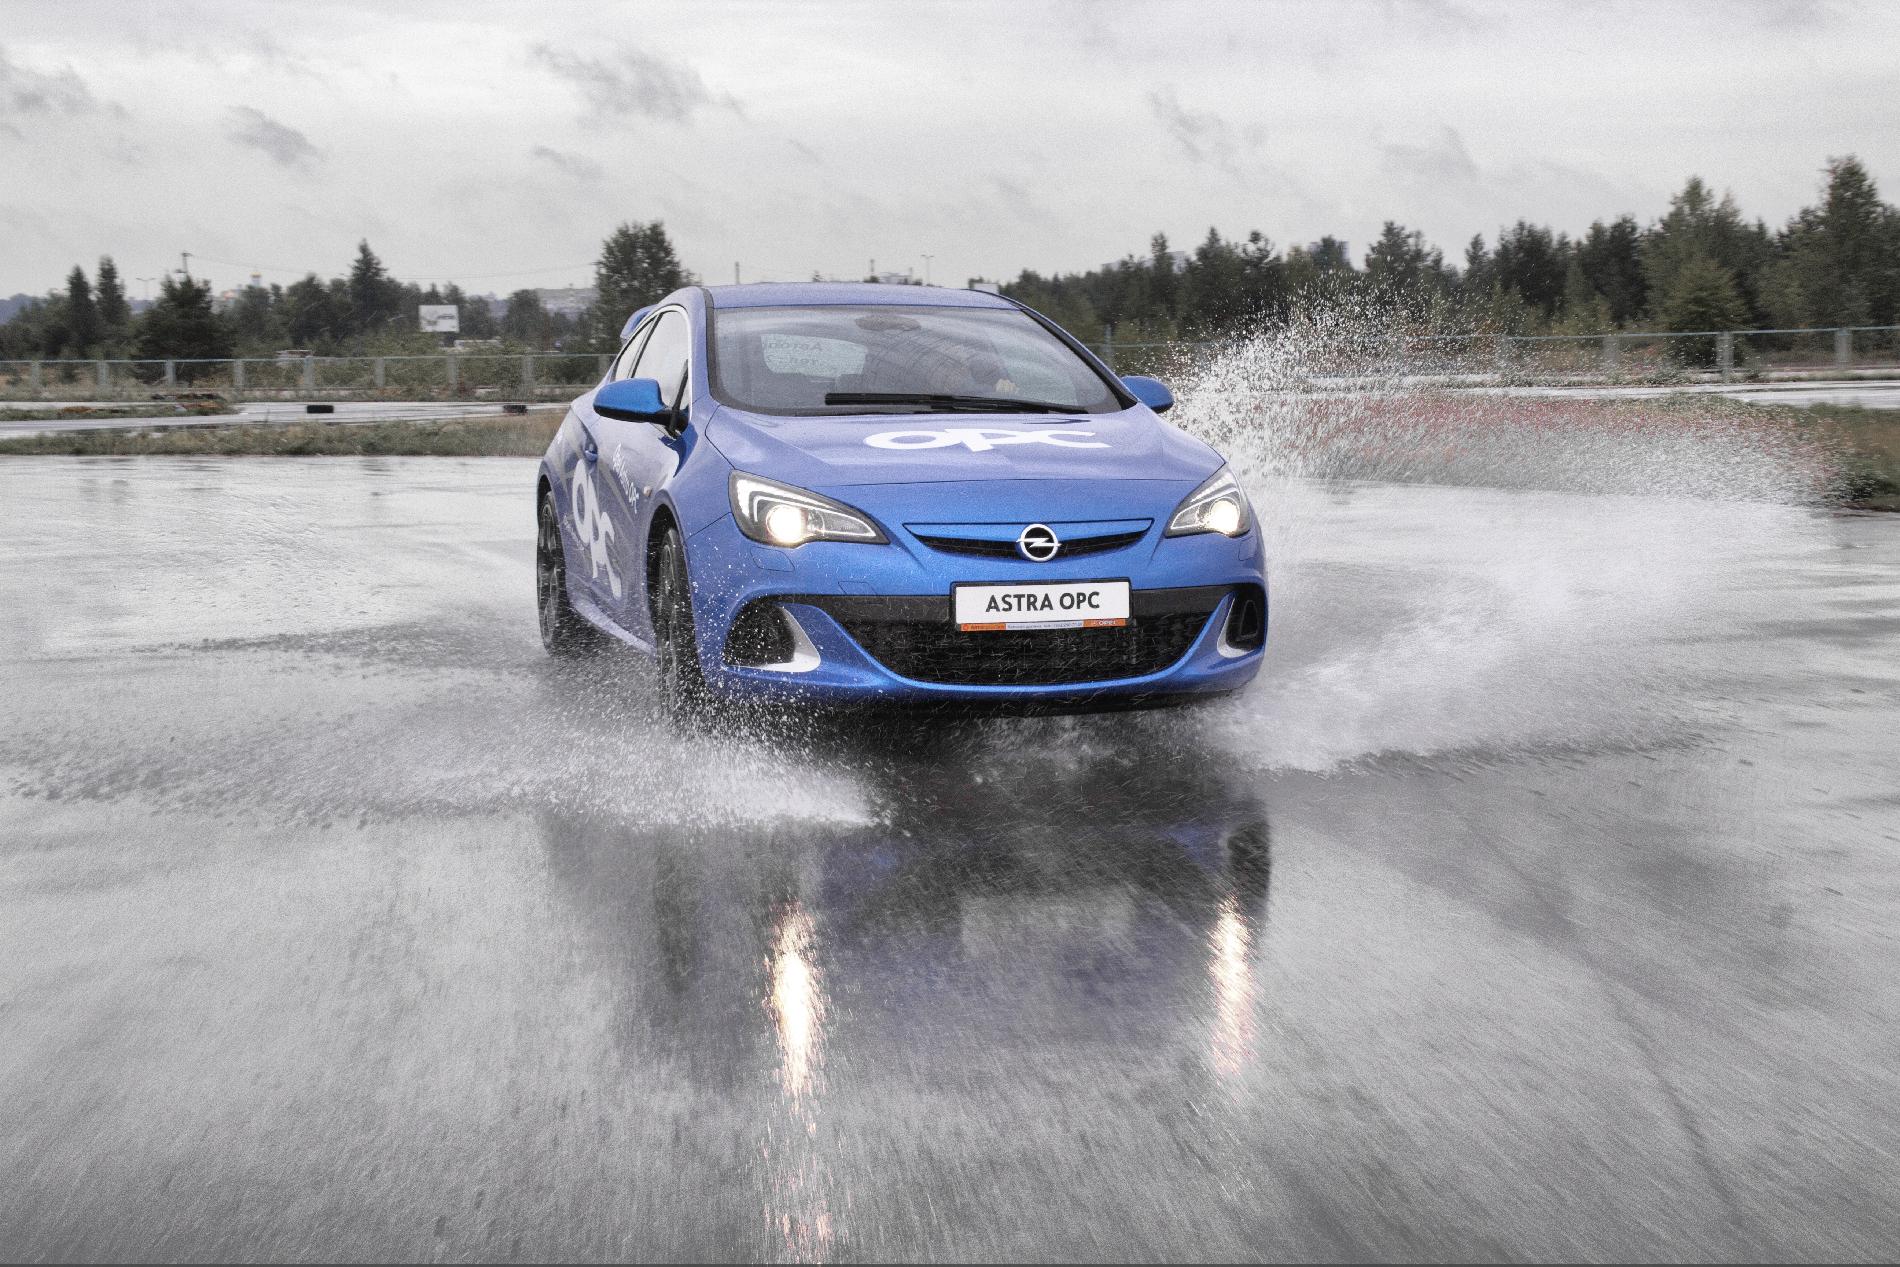 Верхом на пуле: объезжаем дурную Opel Astra OPC